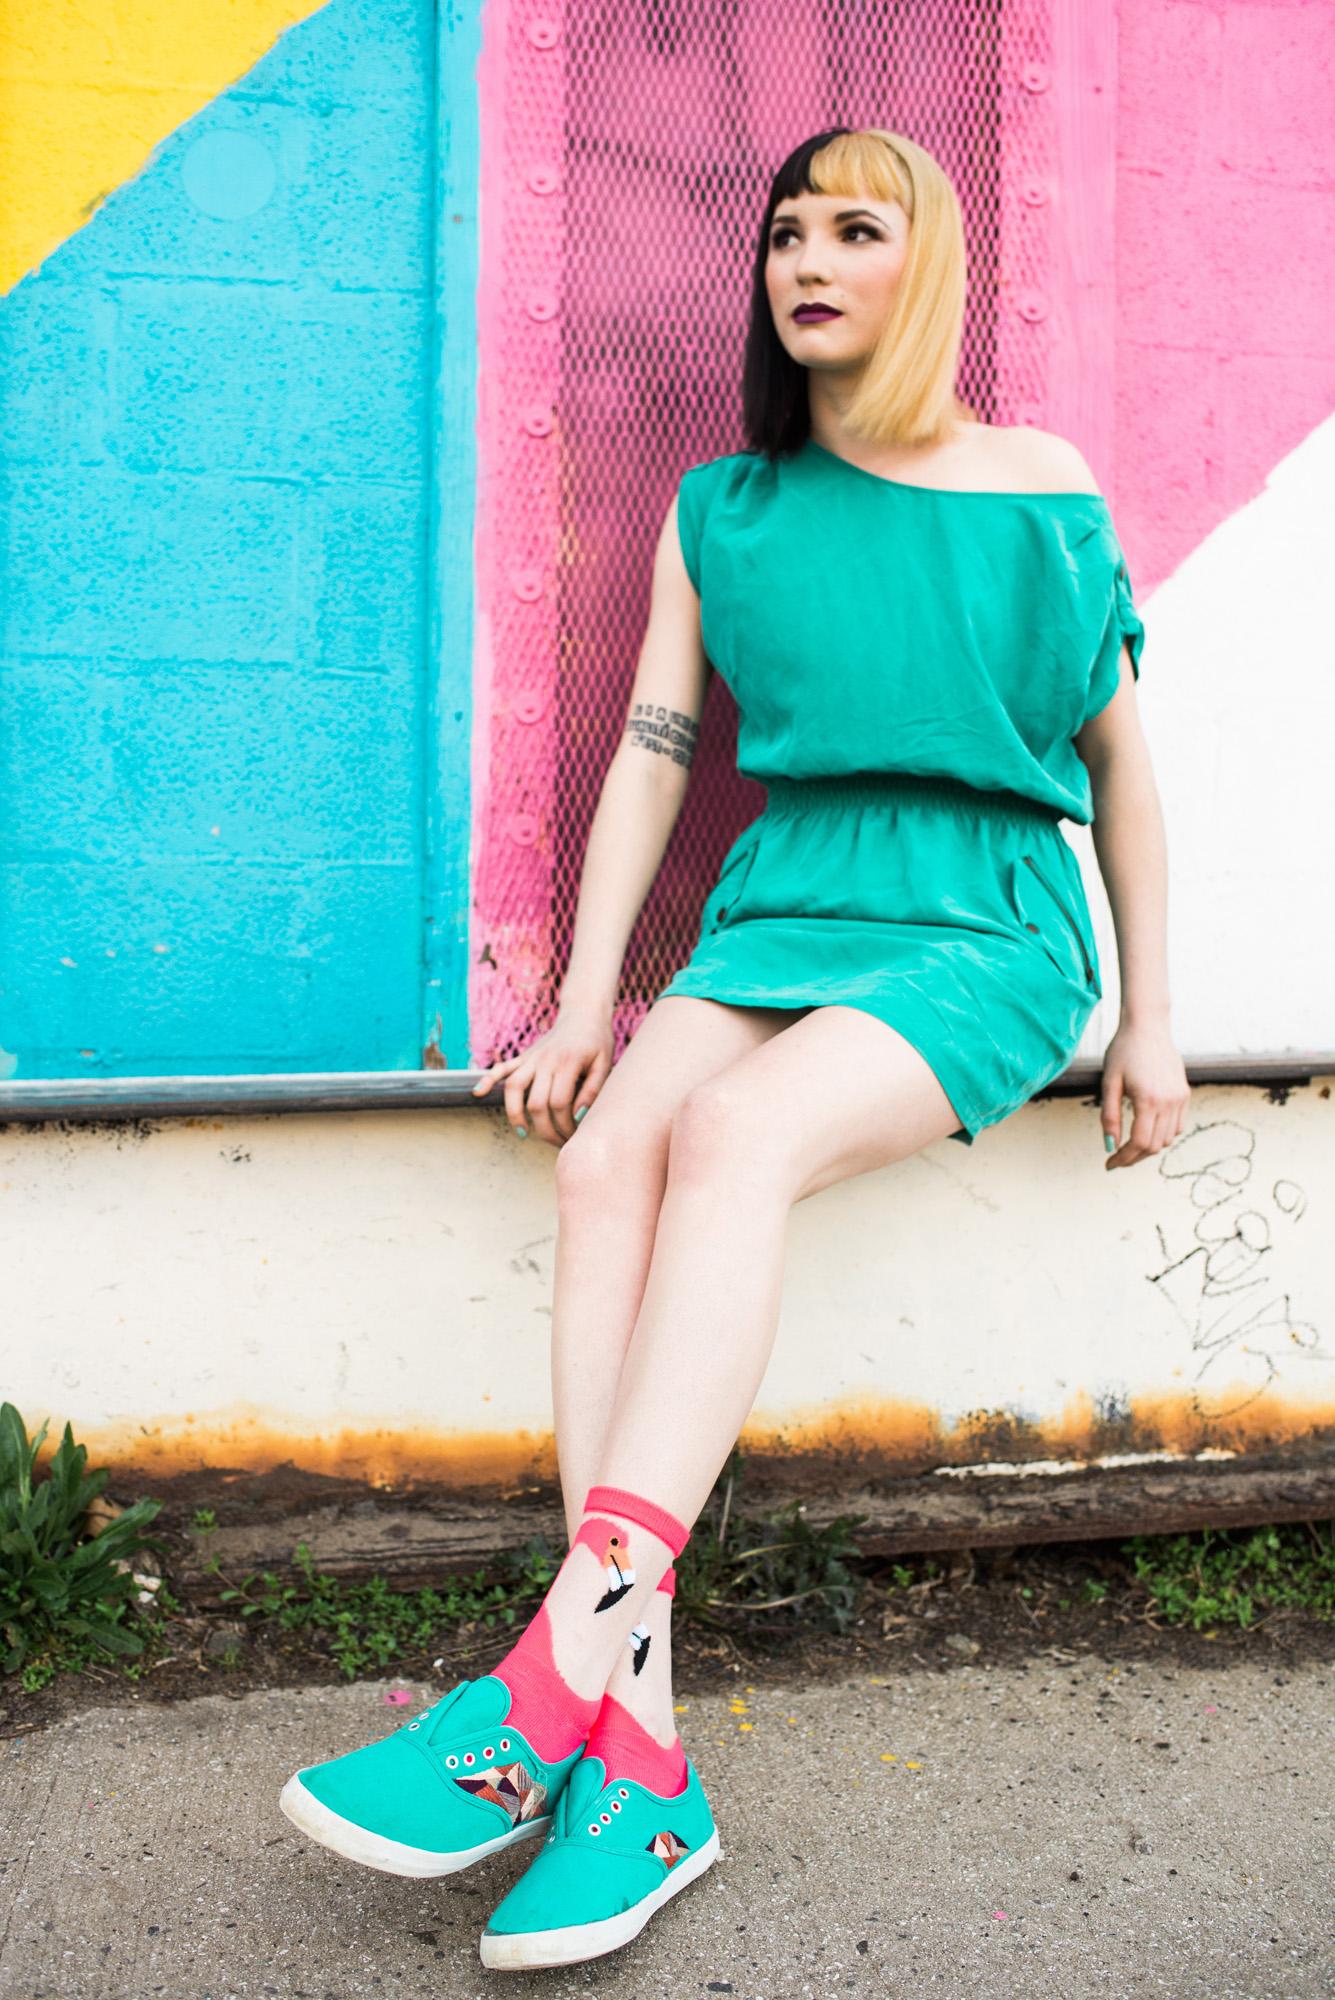 Sarah Hooker Photography | Flamingo Socks, Color Fanatic: Play Every Day, Model Gabriela MacArdle, MUA Tia Hixon, Asheville NC